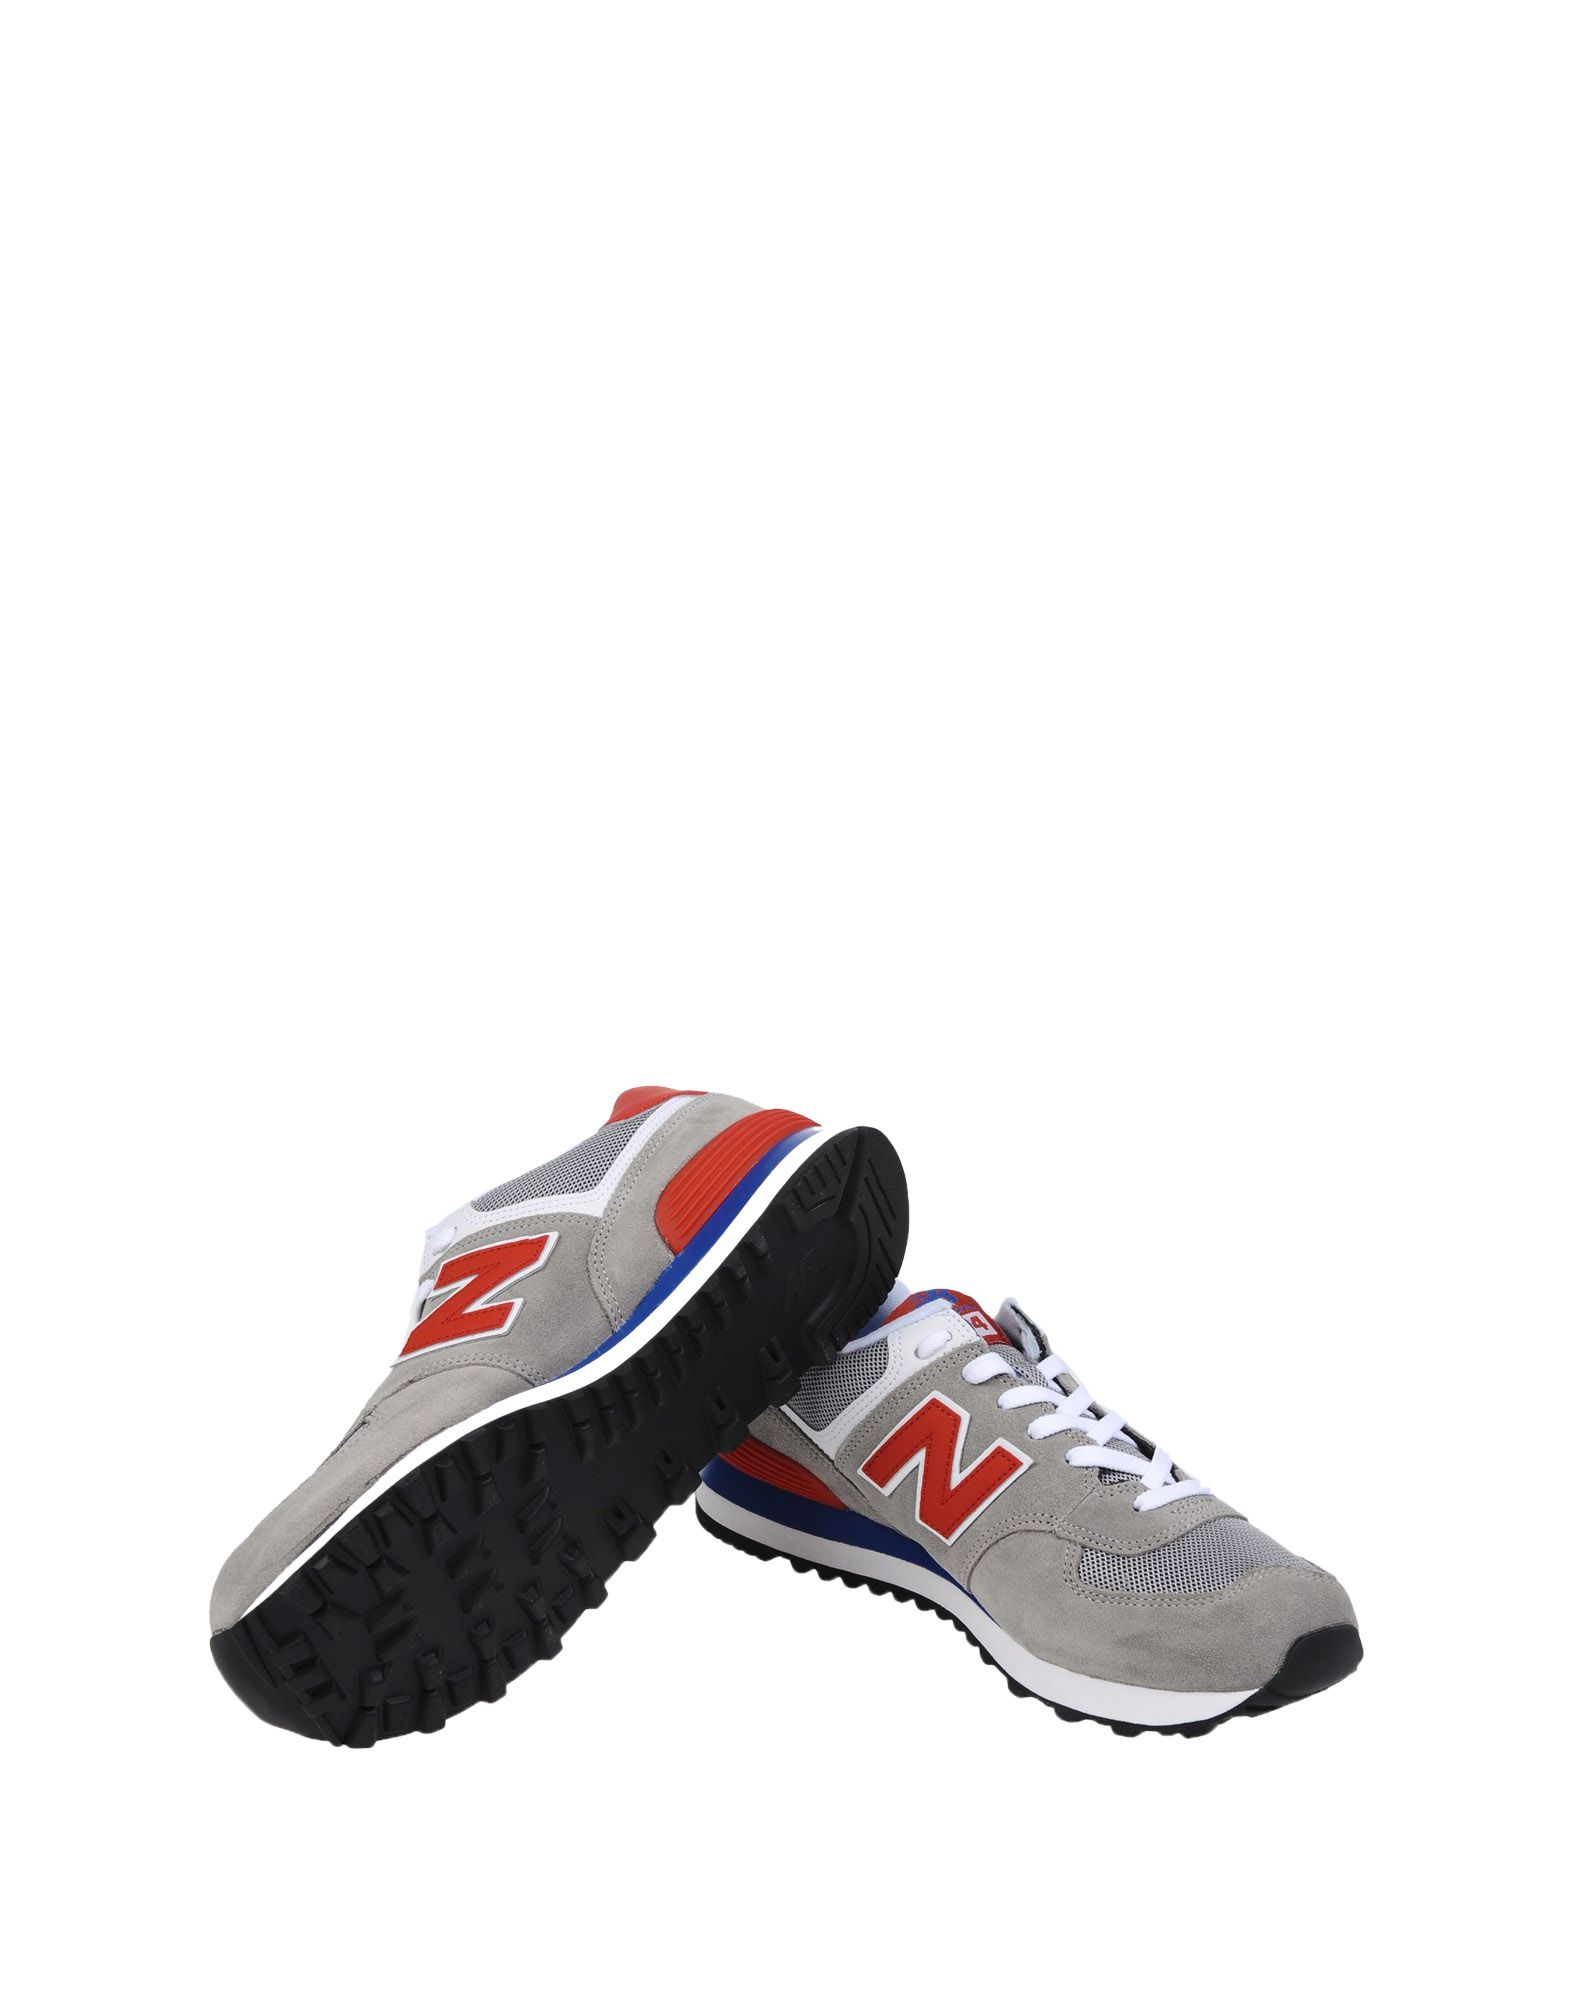 Sneakers New Balance 574 Suede - Mesh Best Sellers - Femme - Sneakers New Balance sur